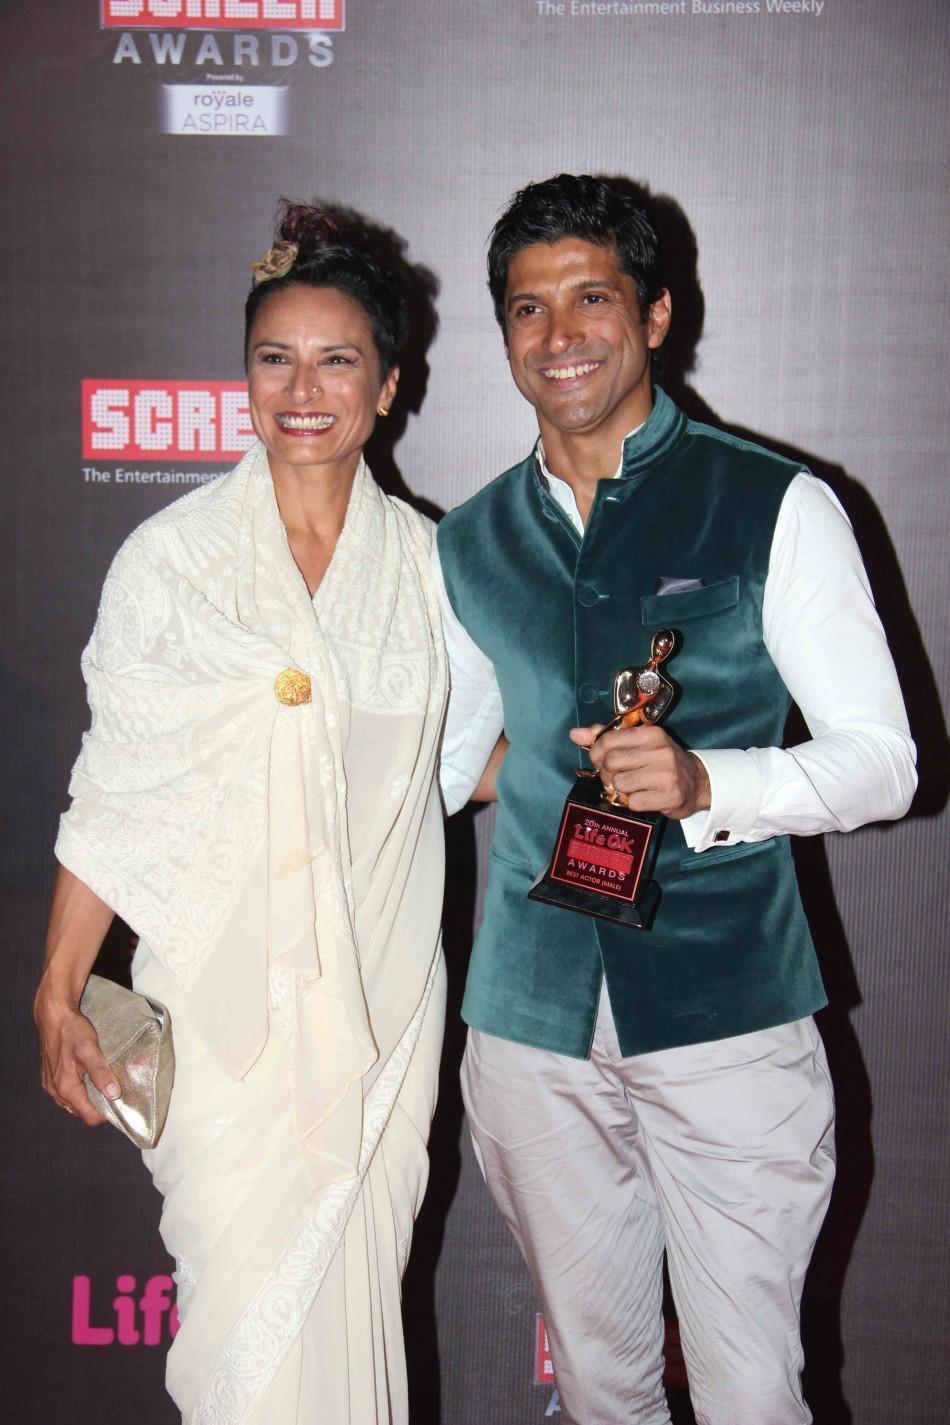 20th Annual Screen Awards